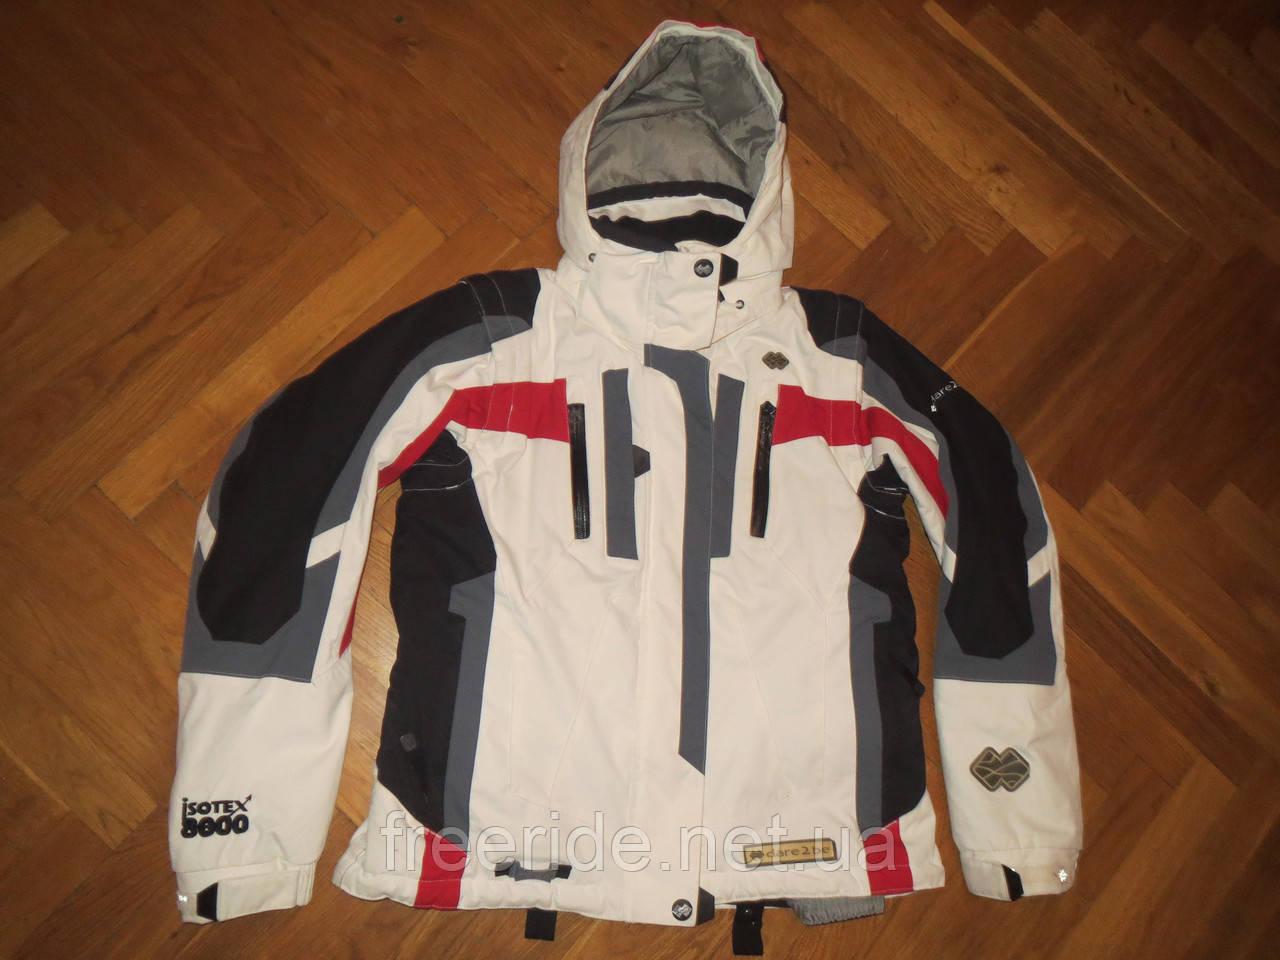 Женская лыжная термокуртка Dare2be (38) Isotex 8000